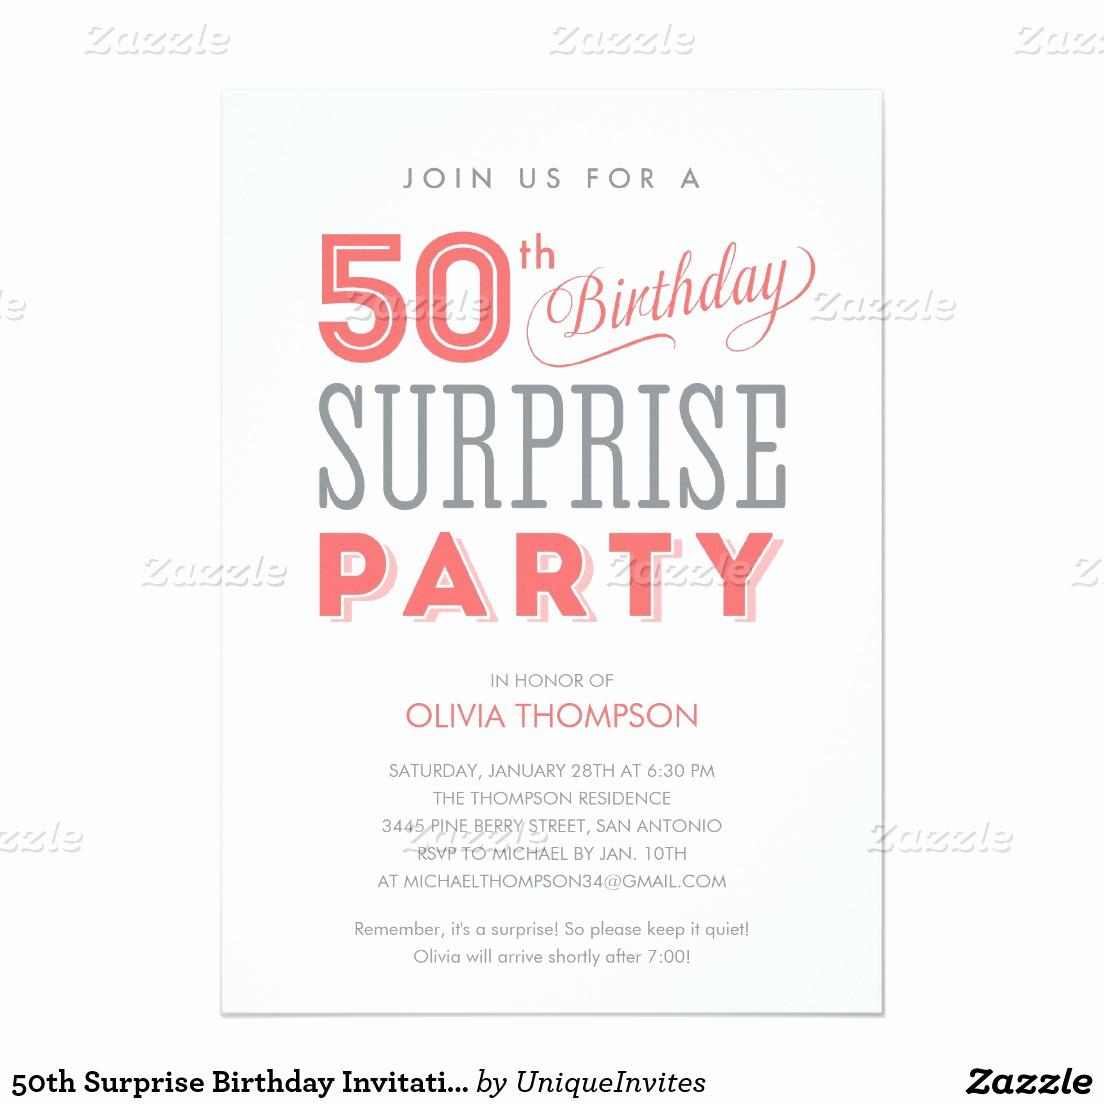 50th Birthday Invitation Templates Elegant 50th Birthday Invitations for Women